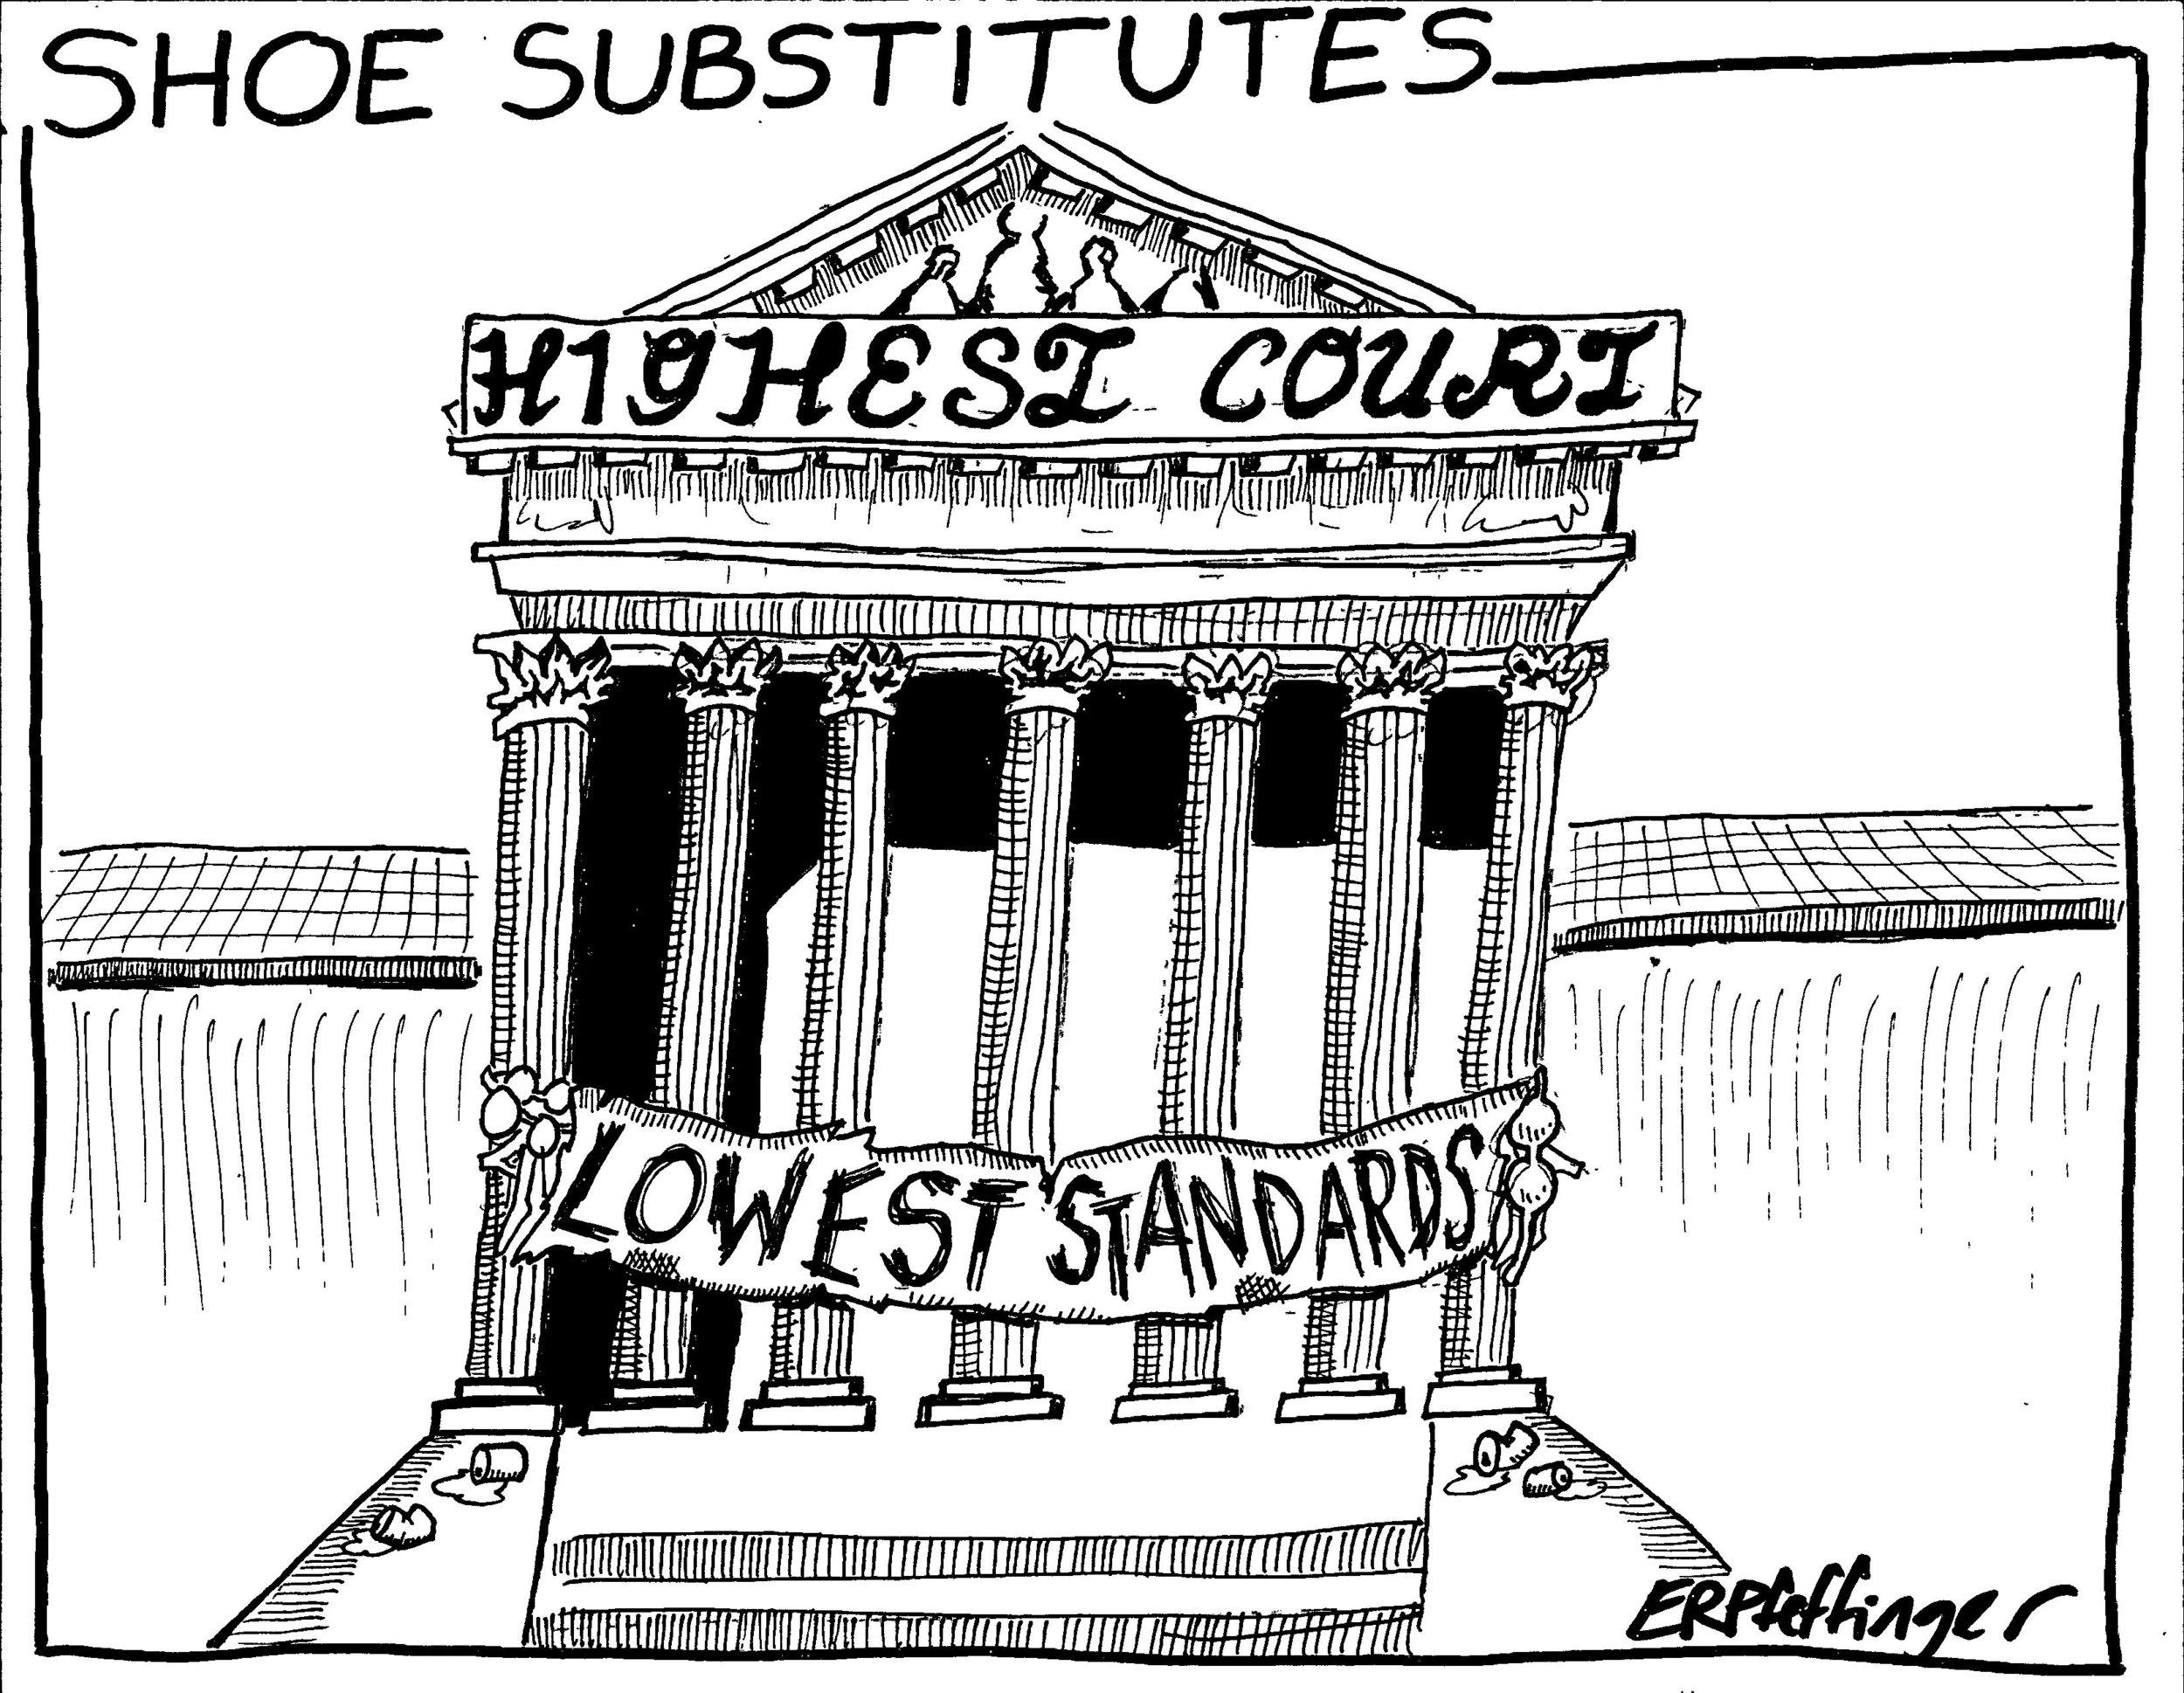 Highest court, lowest standards